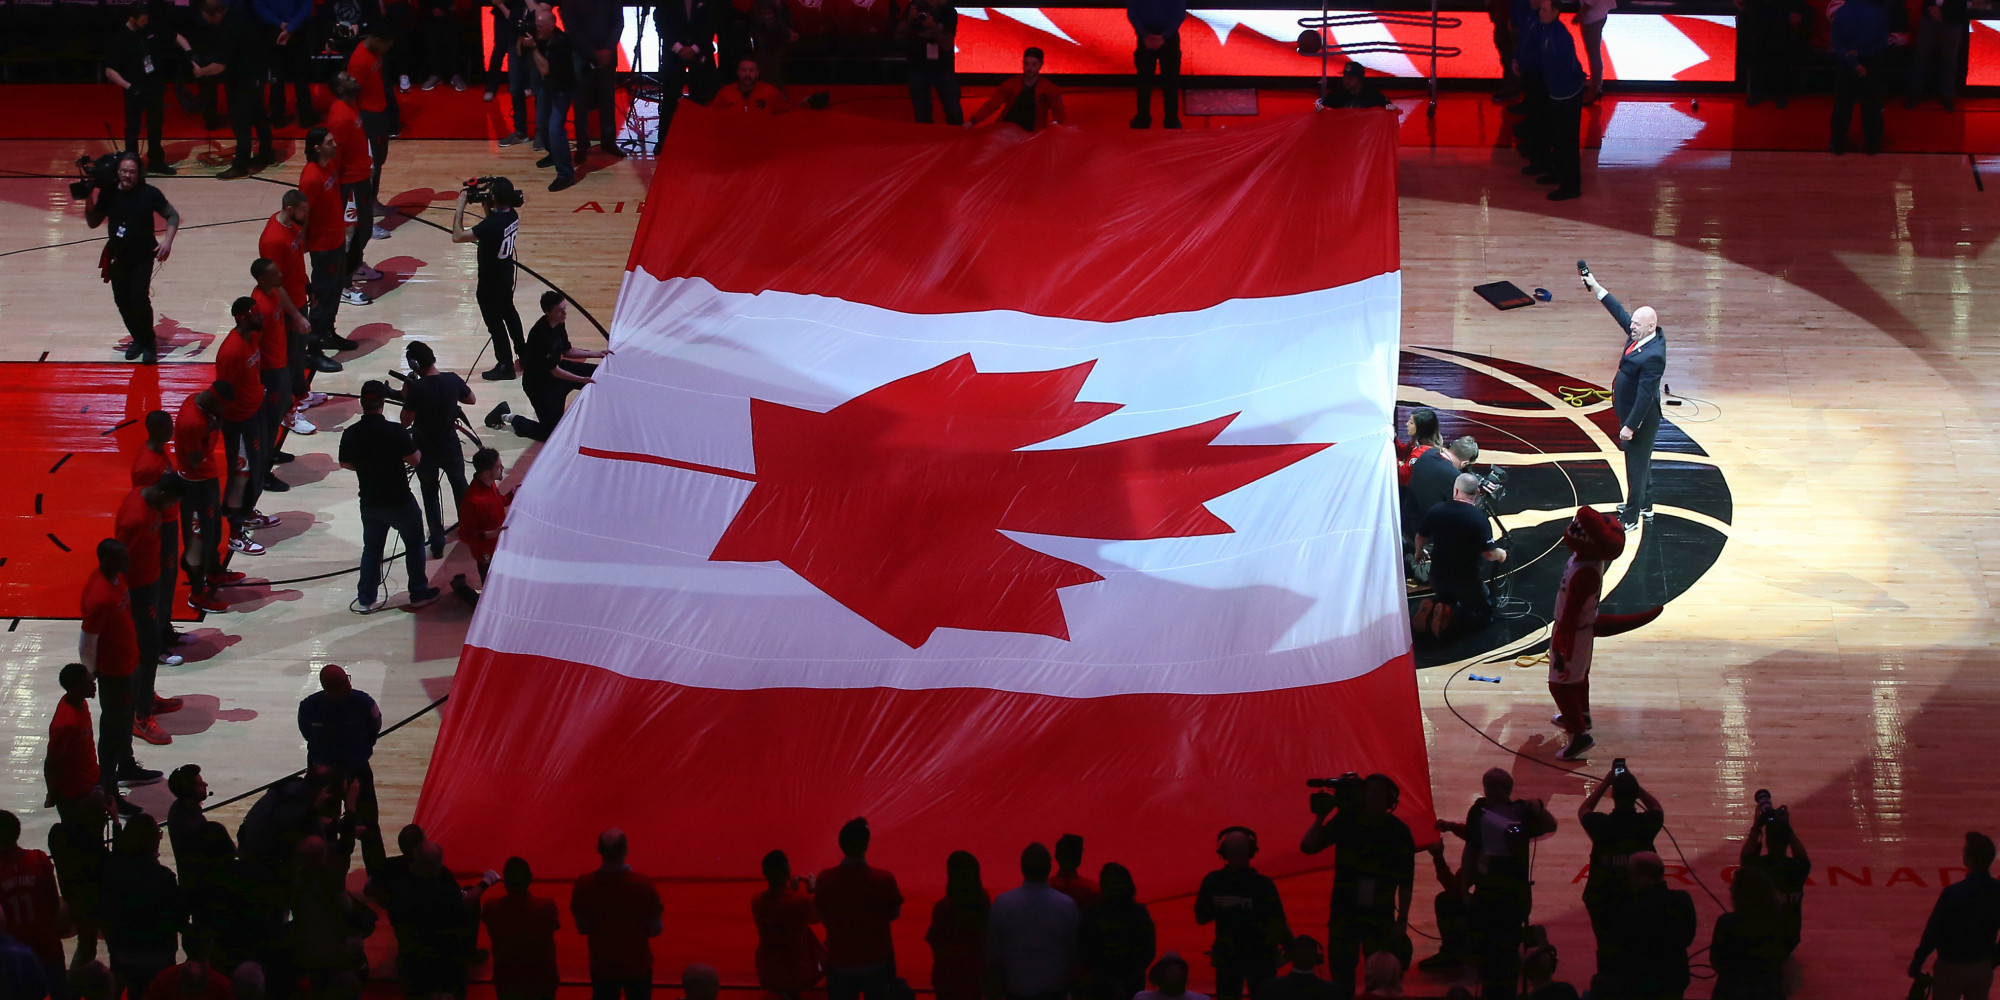 Raptors: Fans Singing 'O Canada' At Toronto Raptors Game Was Pure Magic